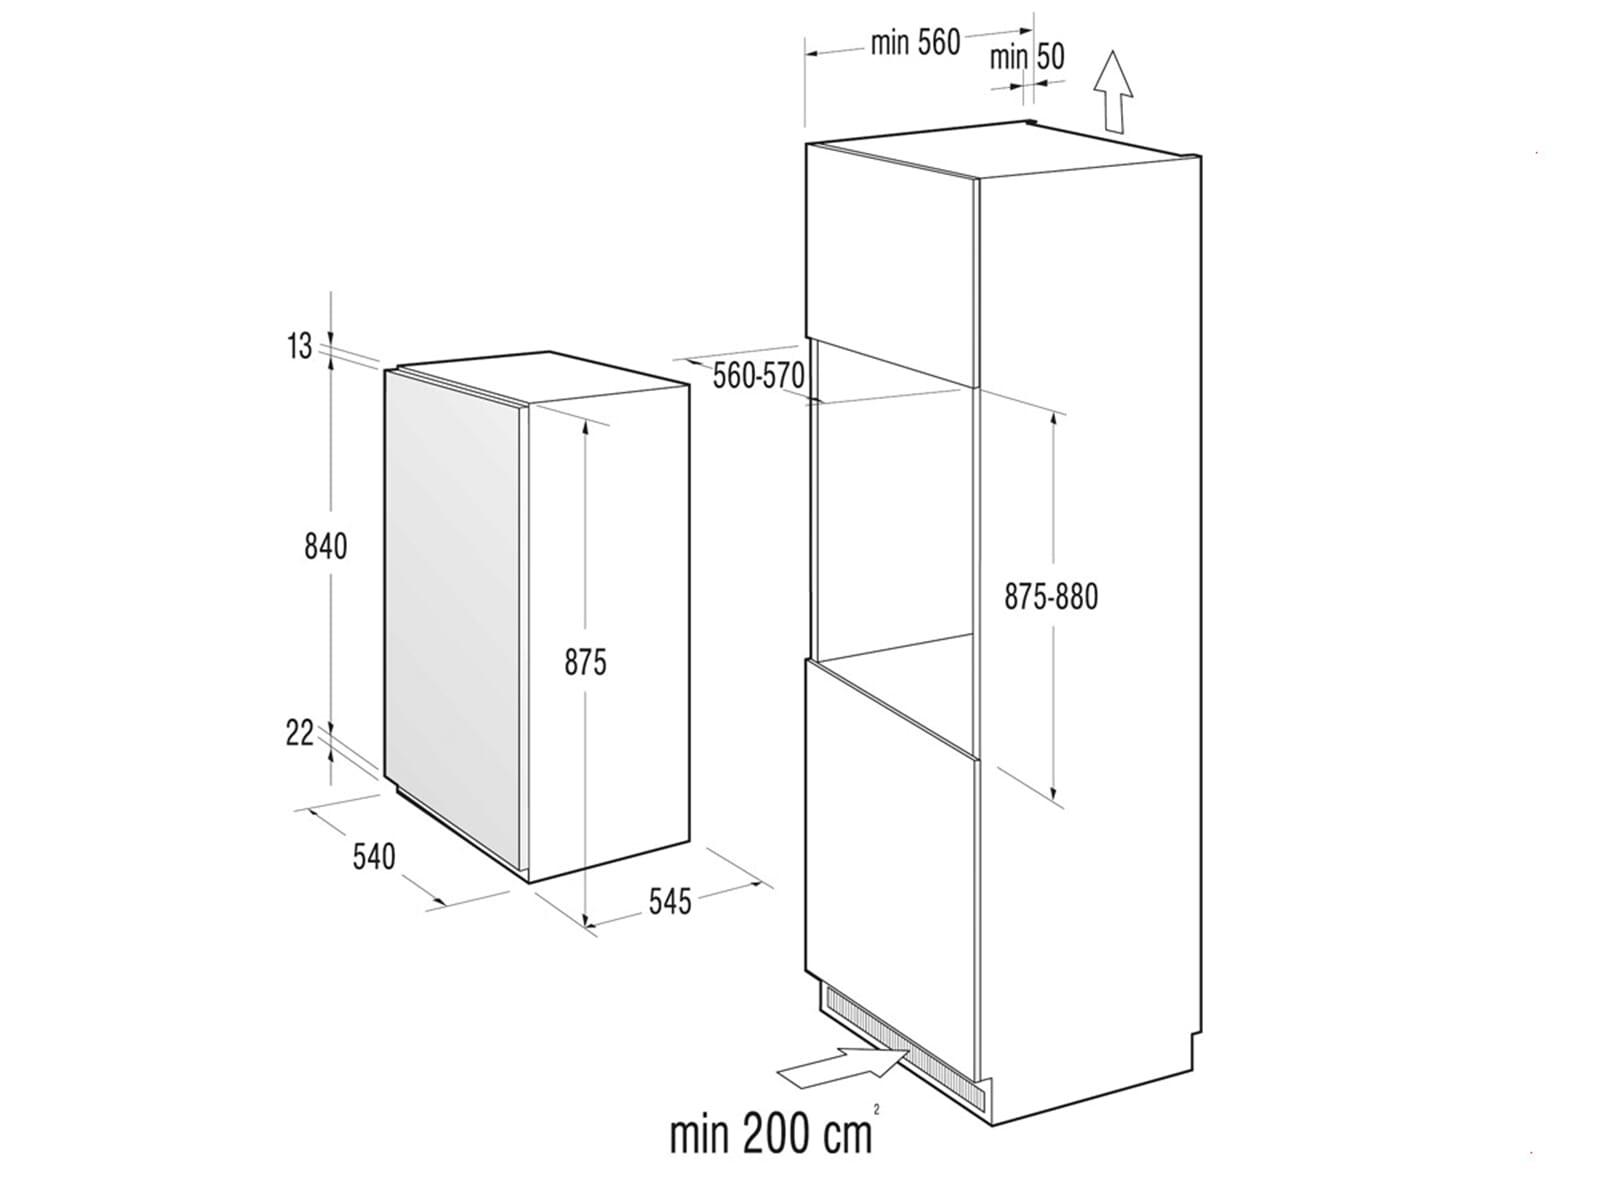 gorenje rbi 4093 aw einbau k hlschrank ebay. Black Bedroom Furniture Sets. Home Design Ideas